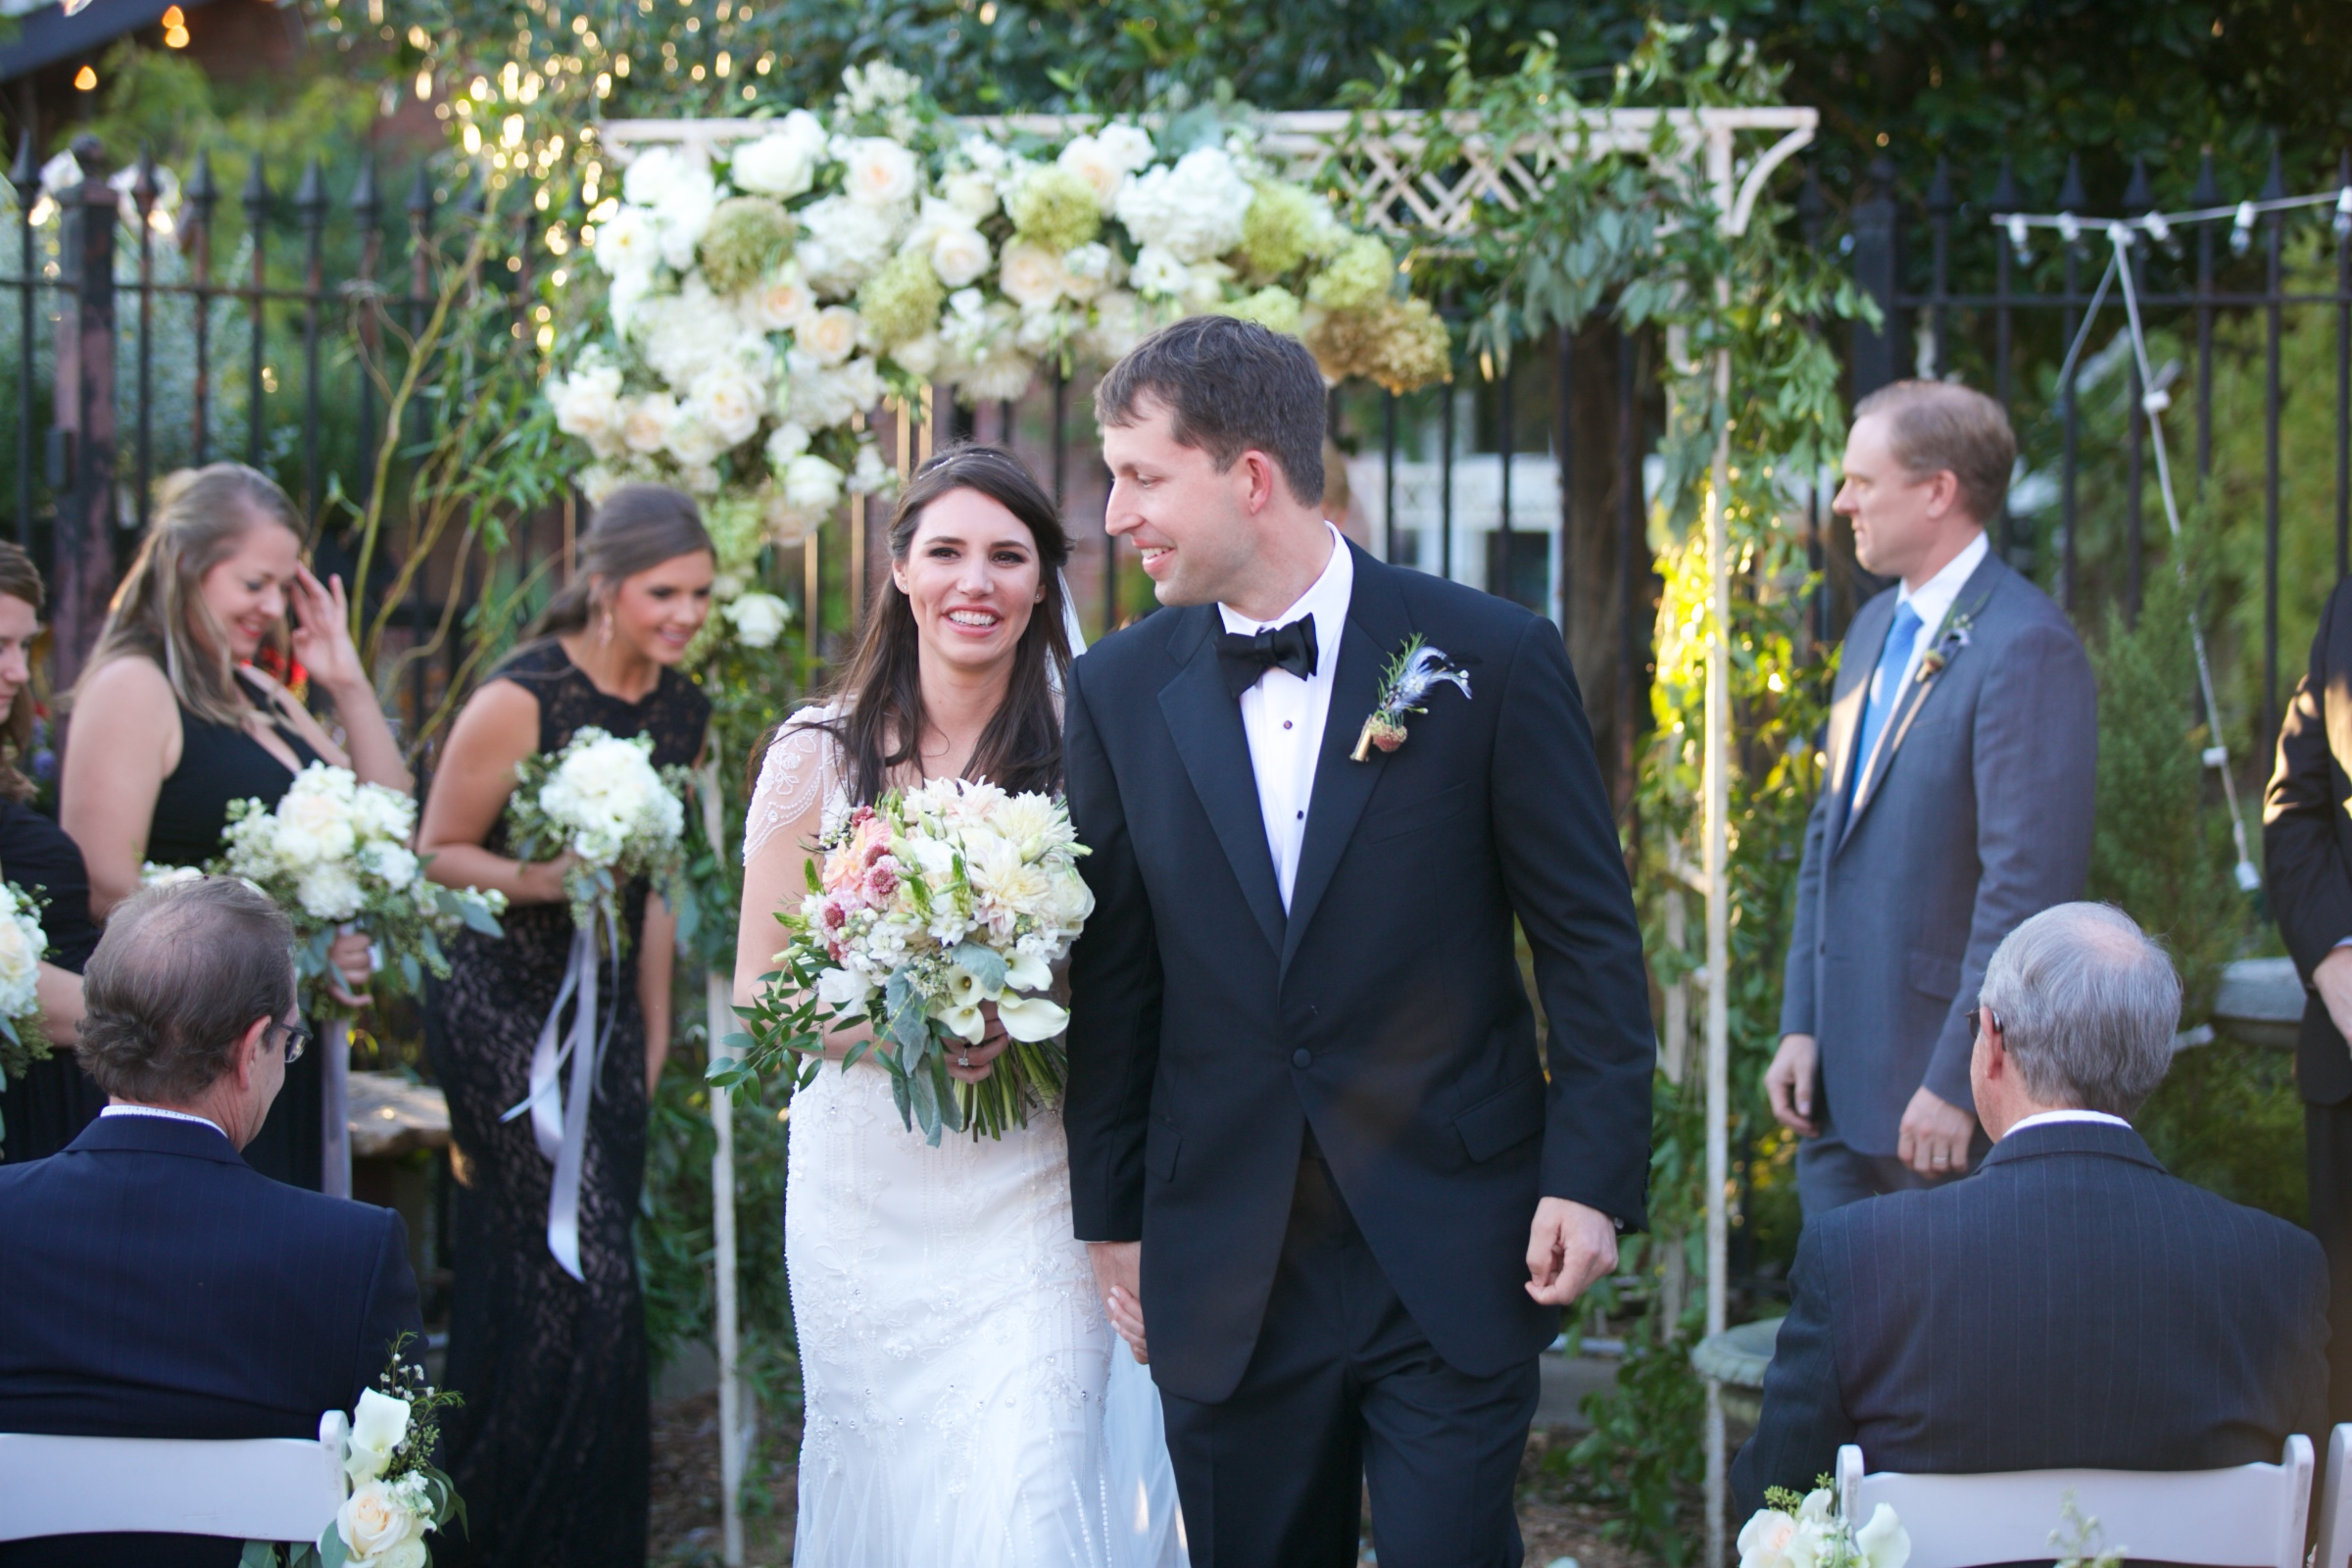 10-08-16 Shannon Hussey & Brad Rodgers 383.jpg